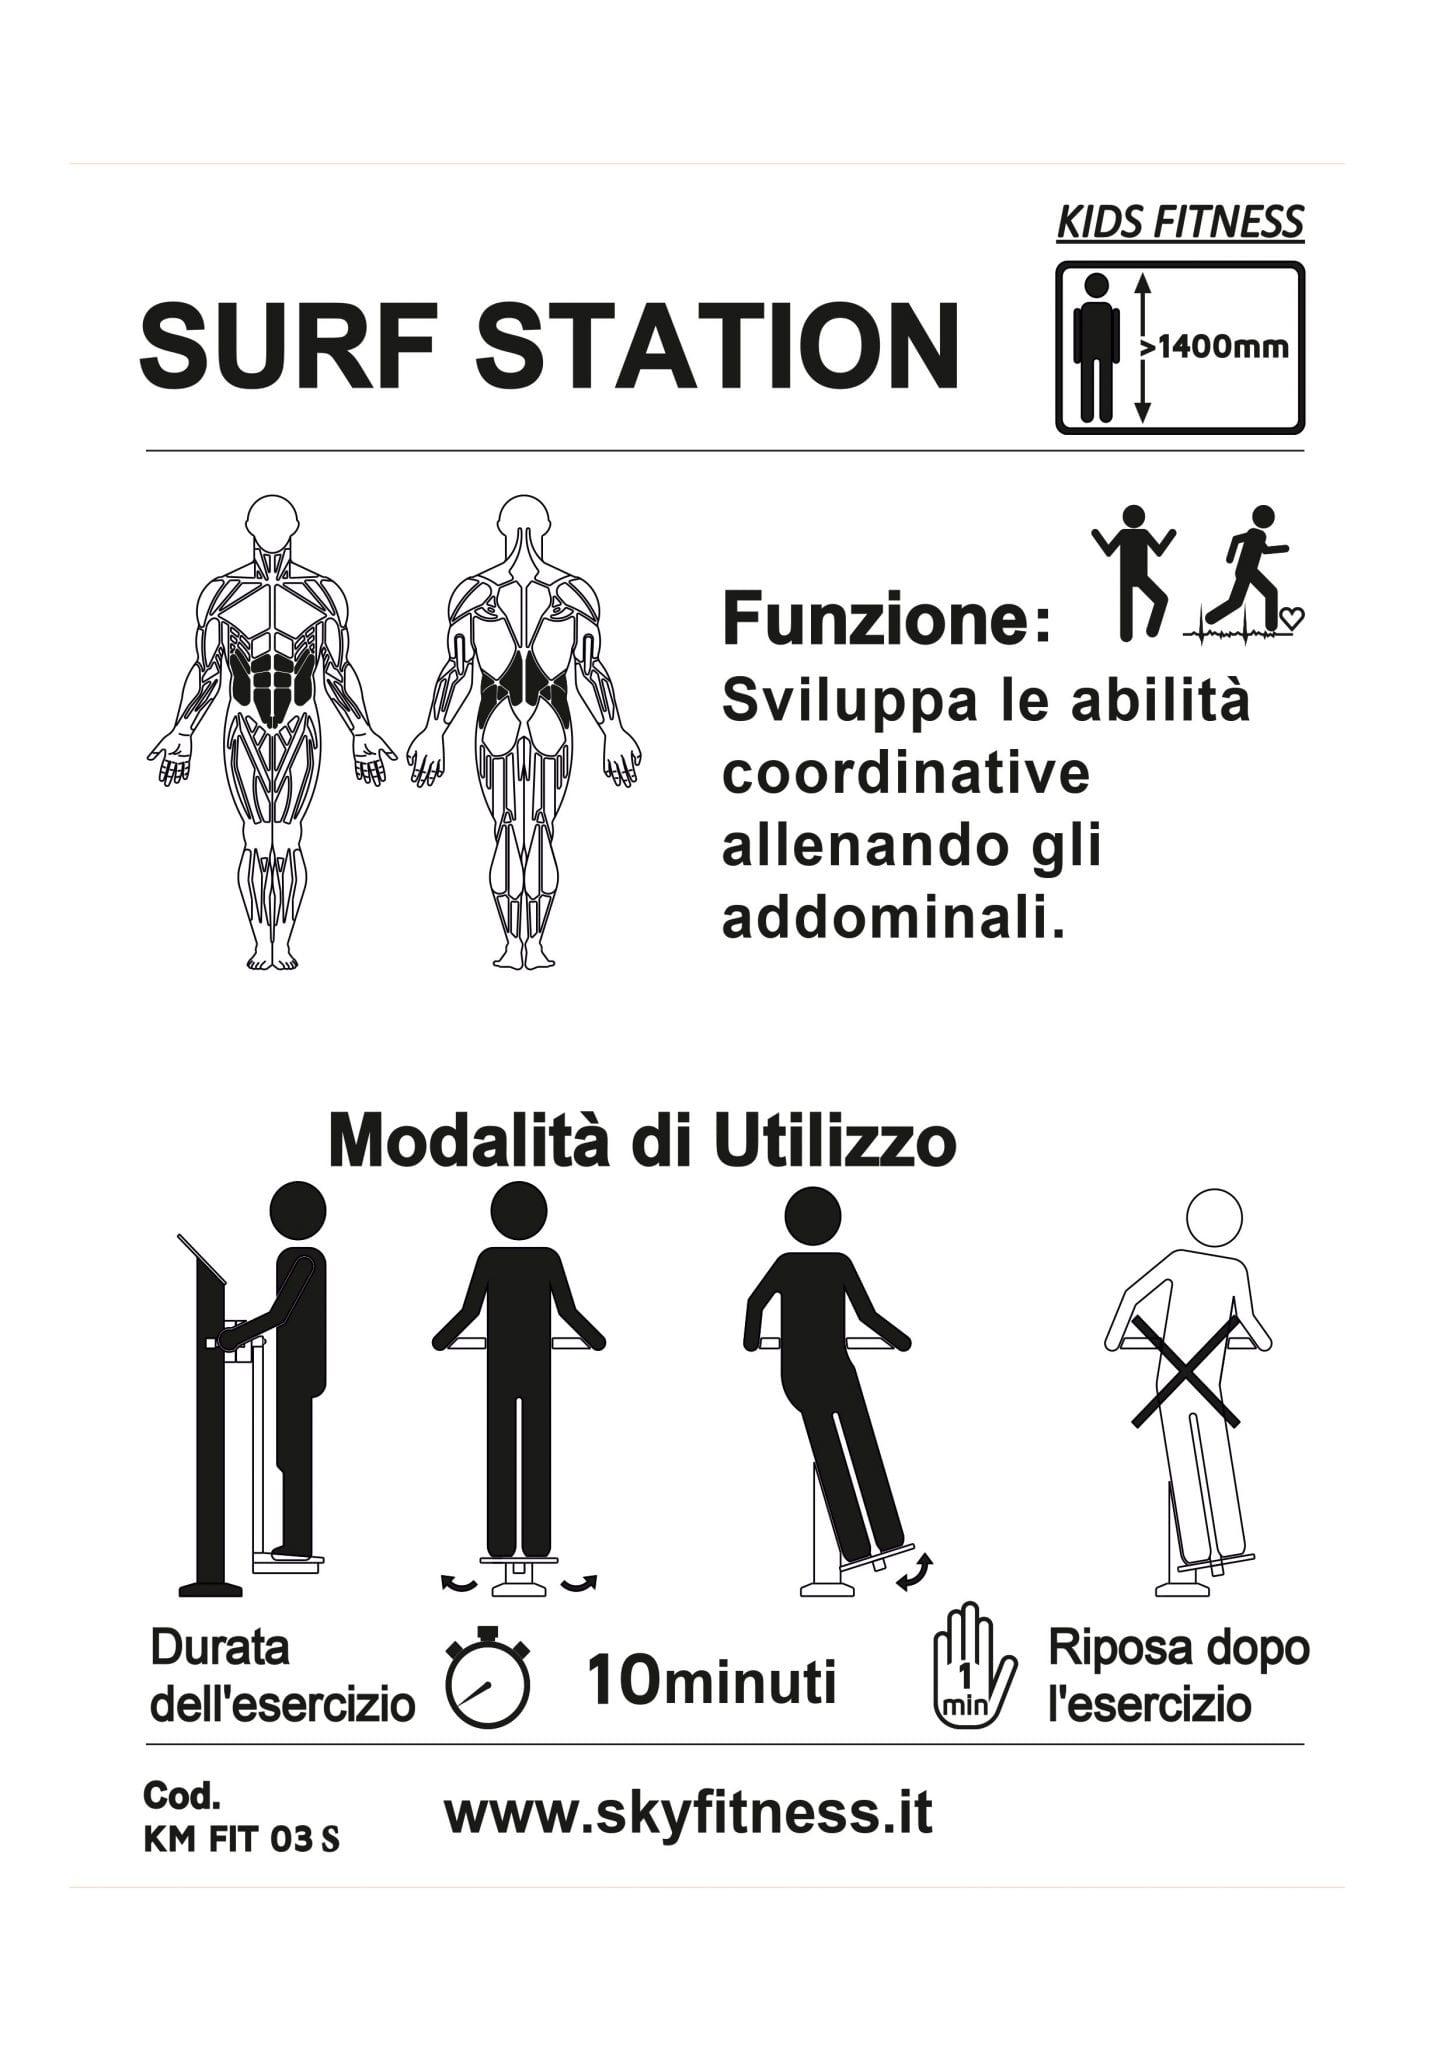 SURF STATION KM FIT 03 S